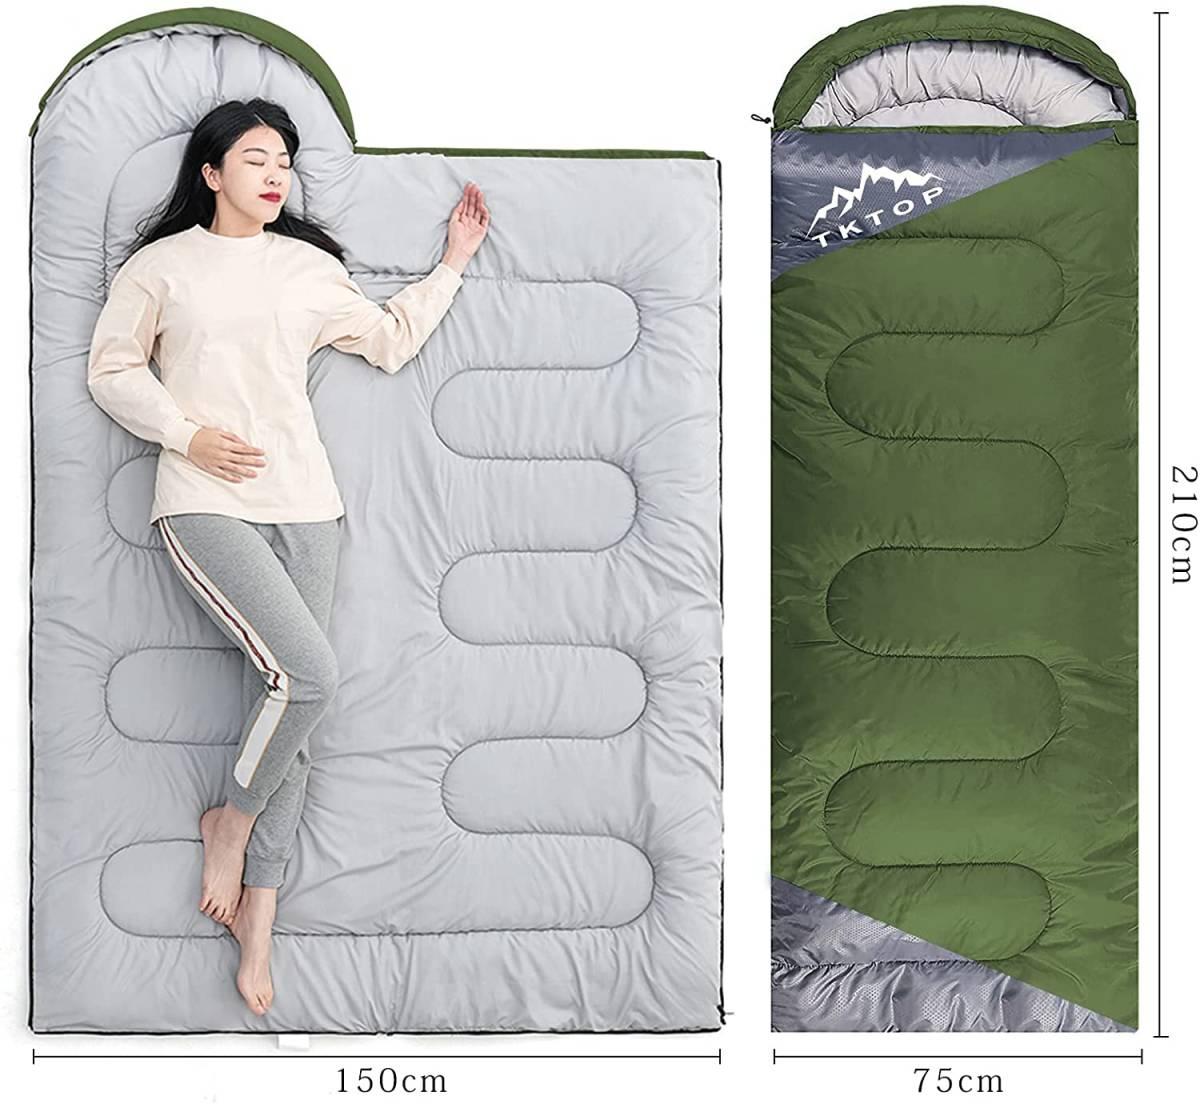 TKTOP 寝袋 封筒型 軽量 保温 210T防水シュラフ アウトドア キャンプ コンパクト 登山 車中泊 防災用 避難用 丸洗い可能 収納パック付き